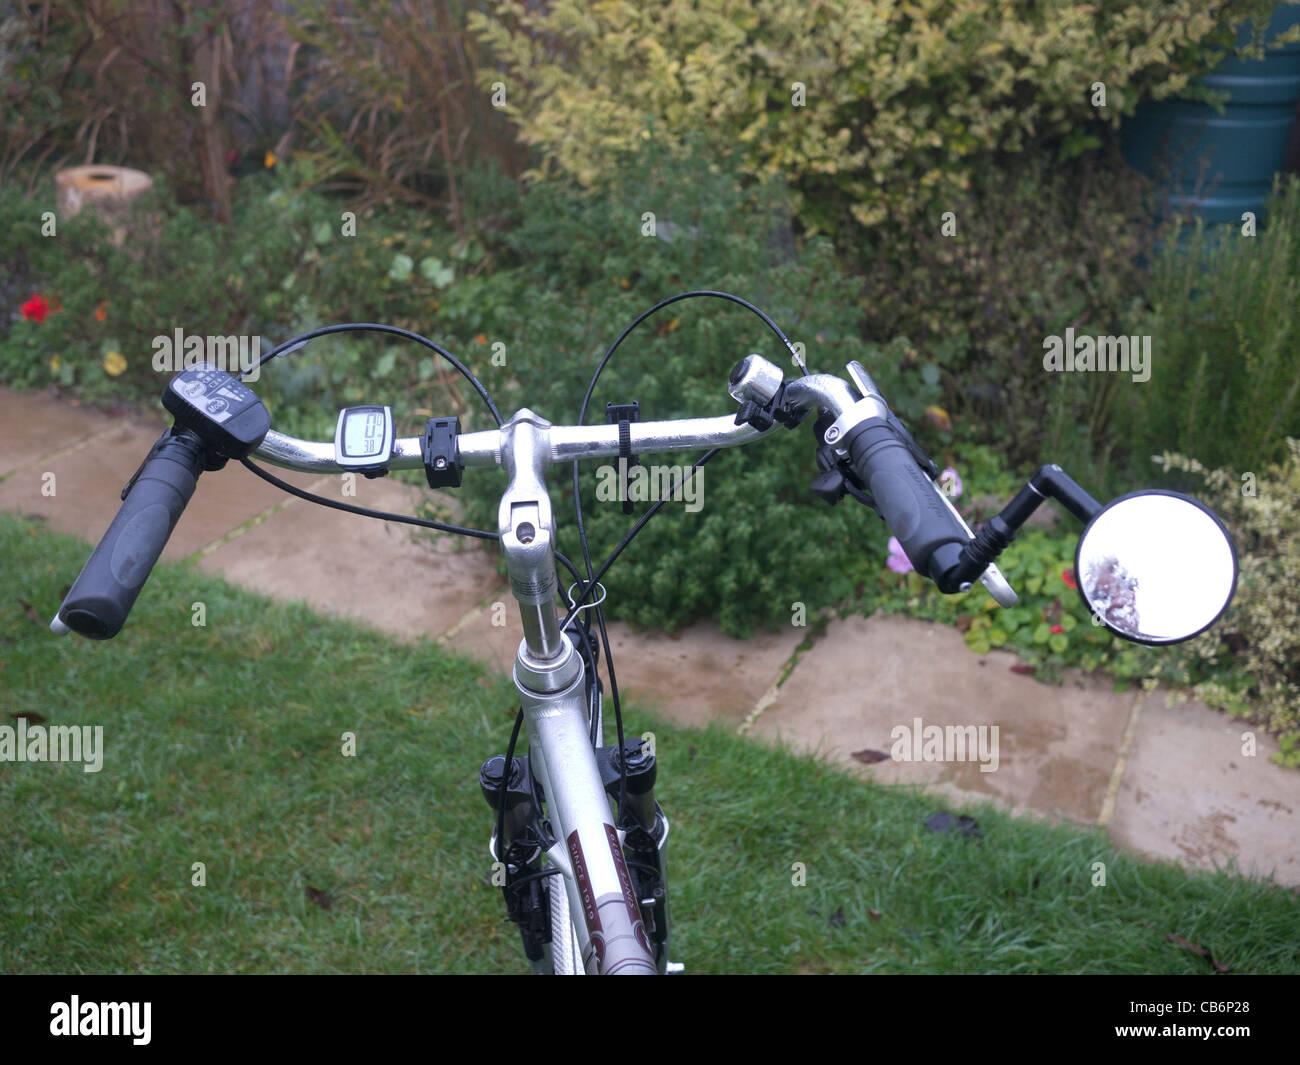 traditional handlebars on an electric bicycle - Stock Image